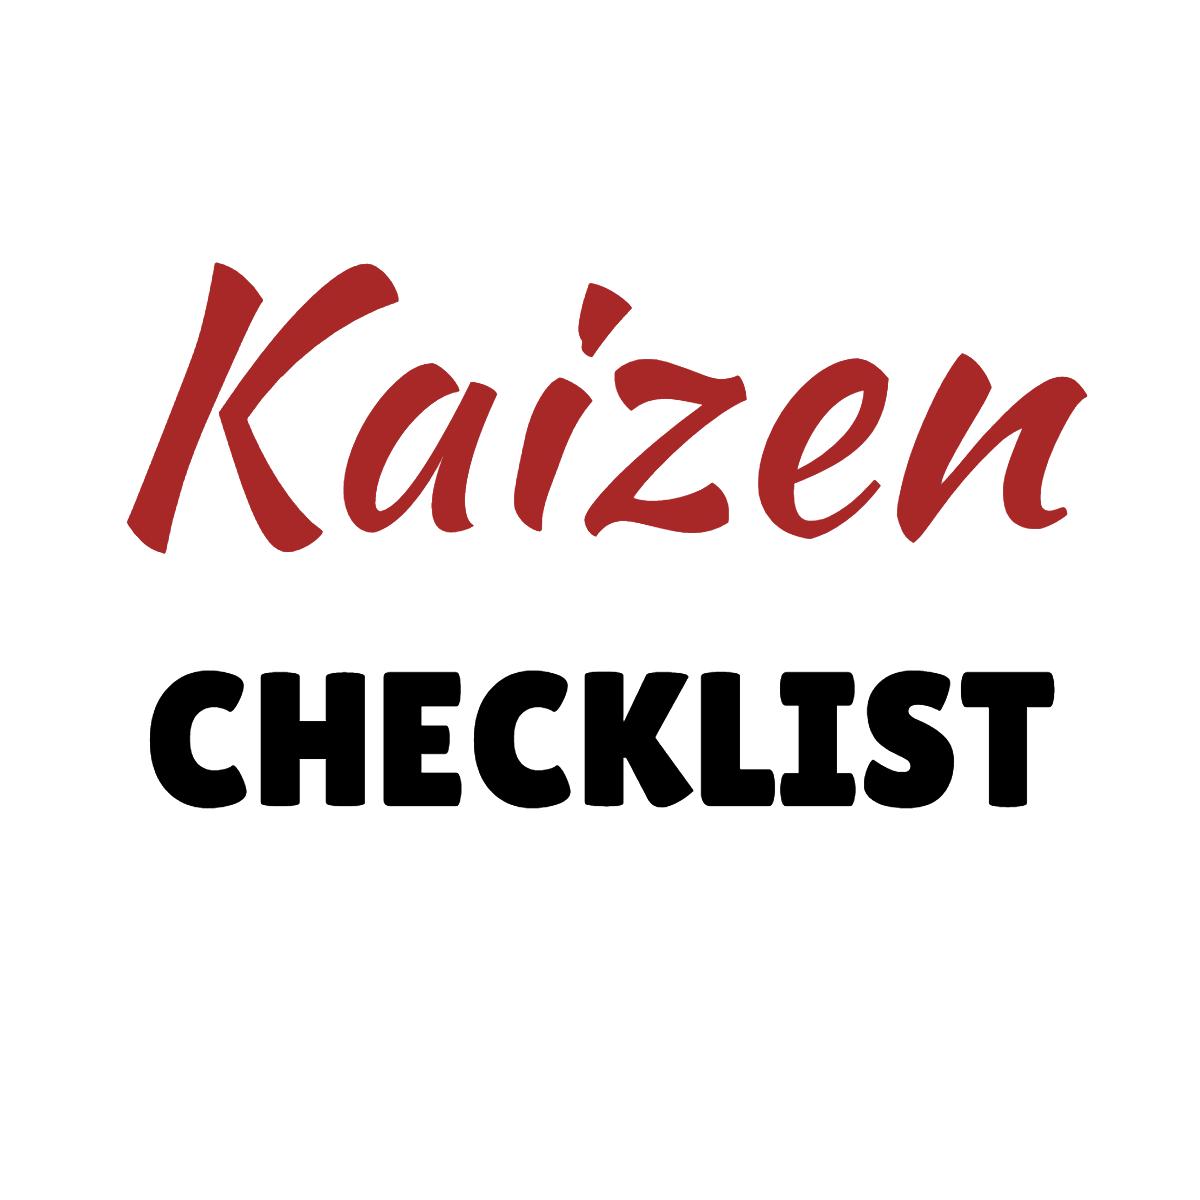 How do you choose the best Kaizen improvement option?